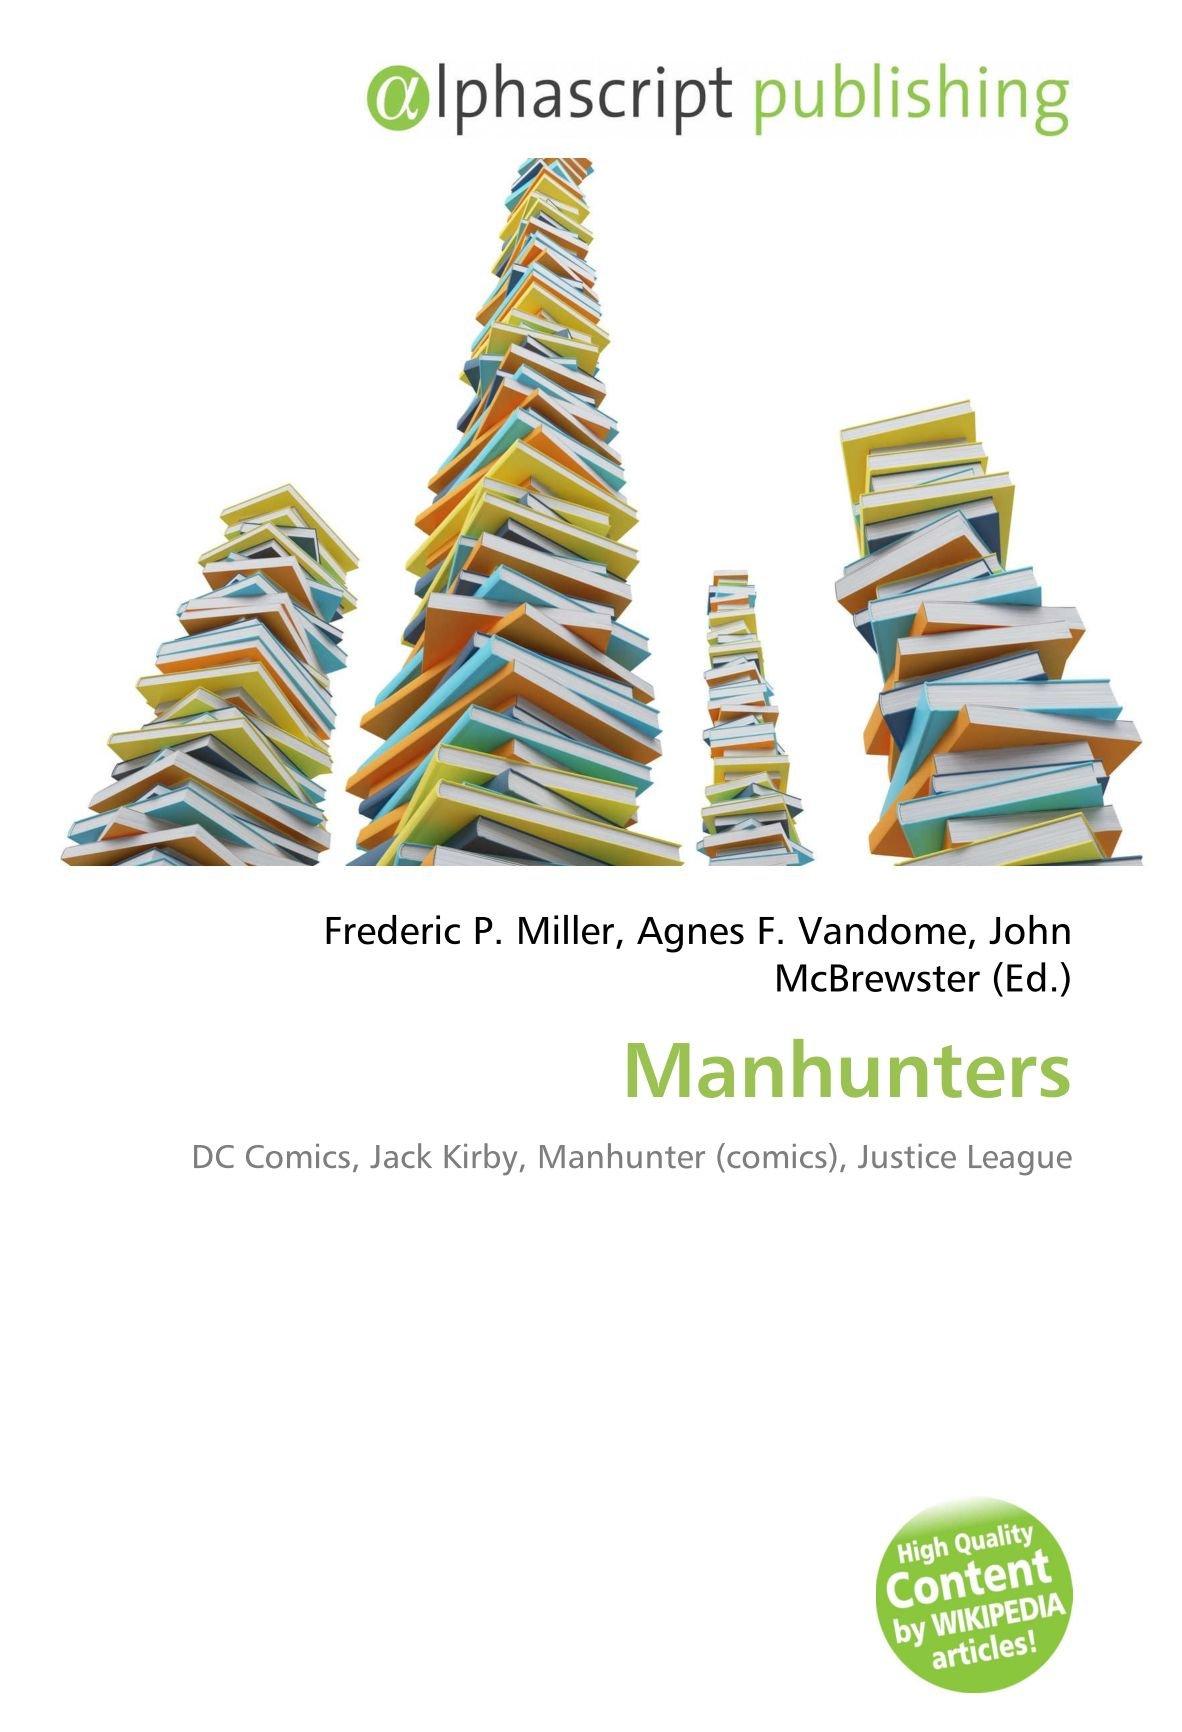 Manhunters: DC Comics, Jack Kirby, Manhunter comics , Justice League: Amazon.es: Miller, Frederic P, Vandome, Agnes F, McBrewster, John: Libros en idiomas extranjeros